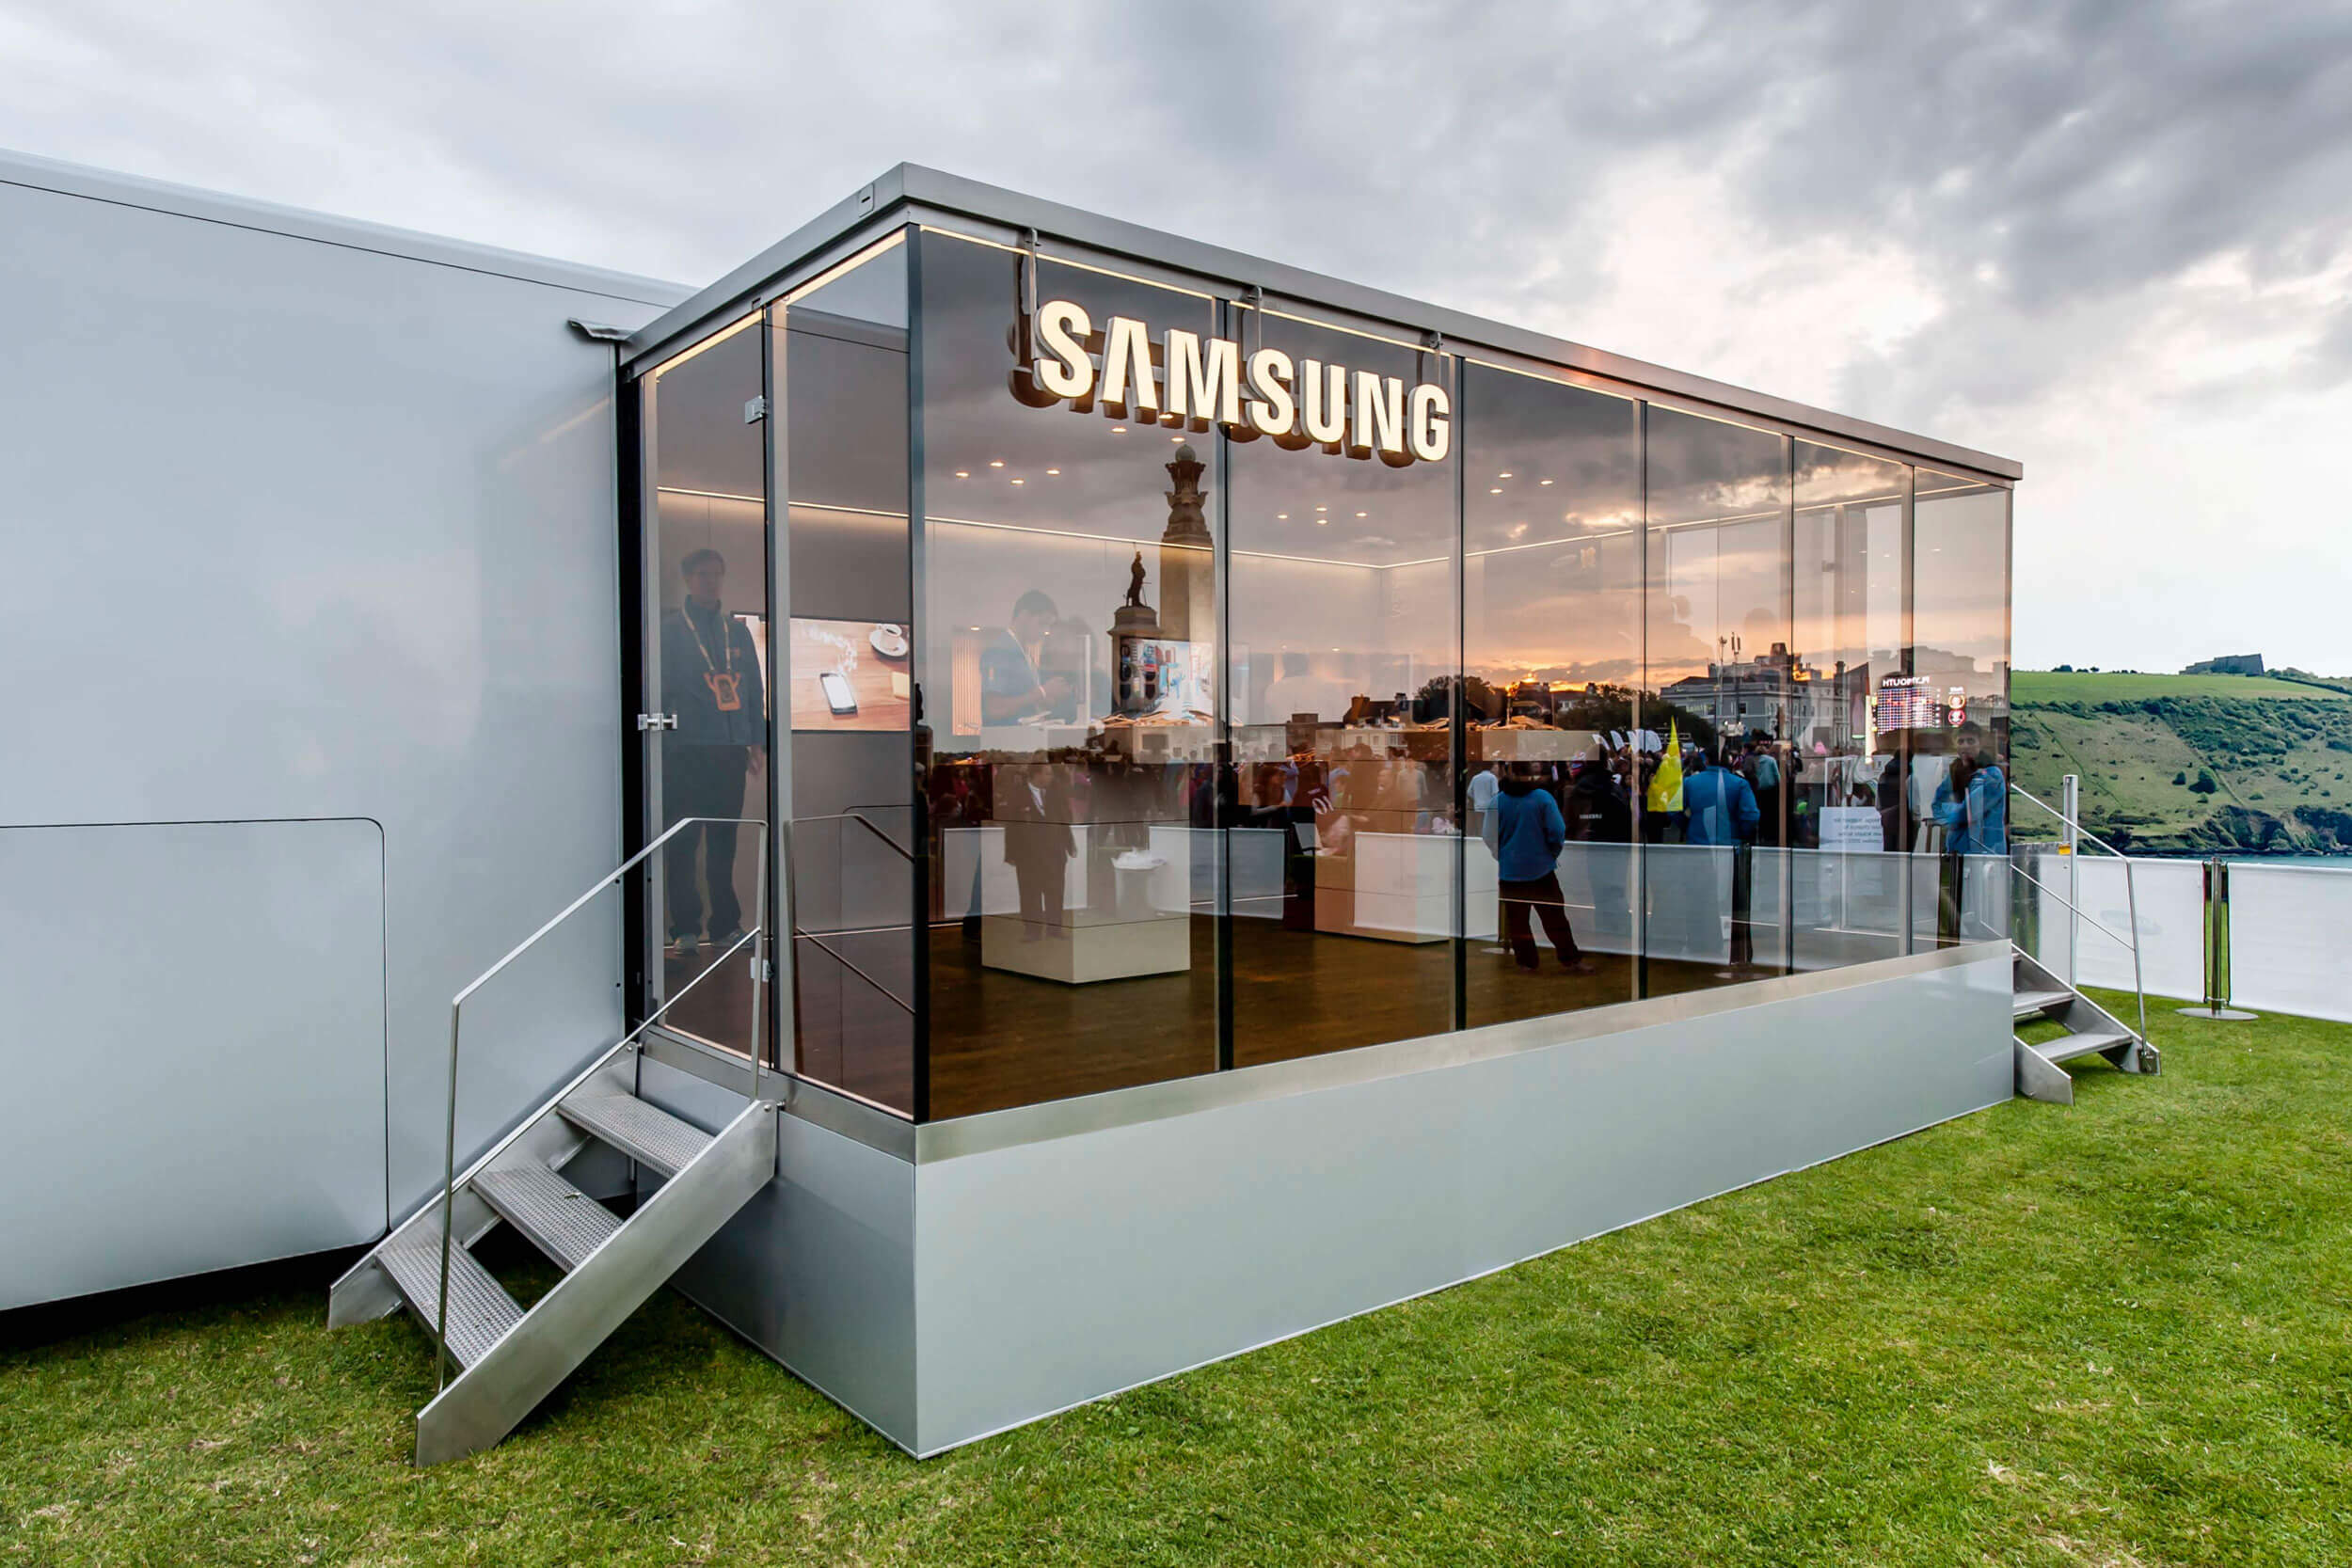 Beleuchteter Bereich des Samsung Olympic Parks